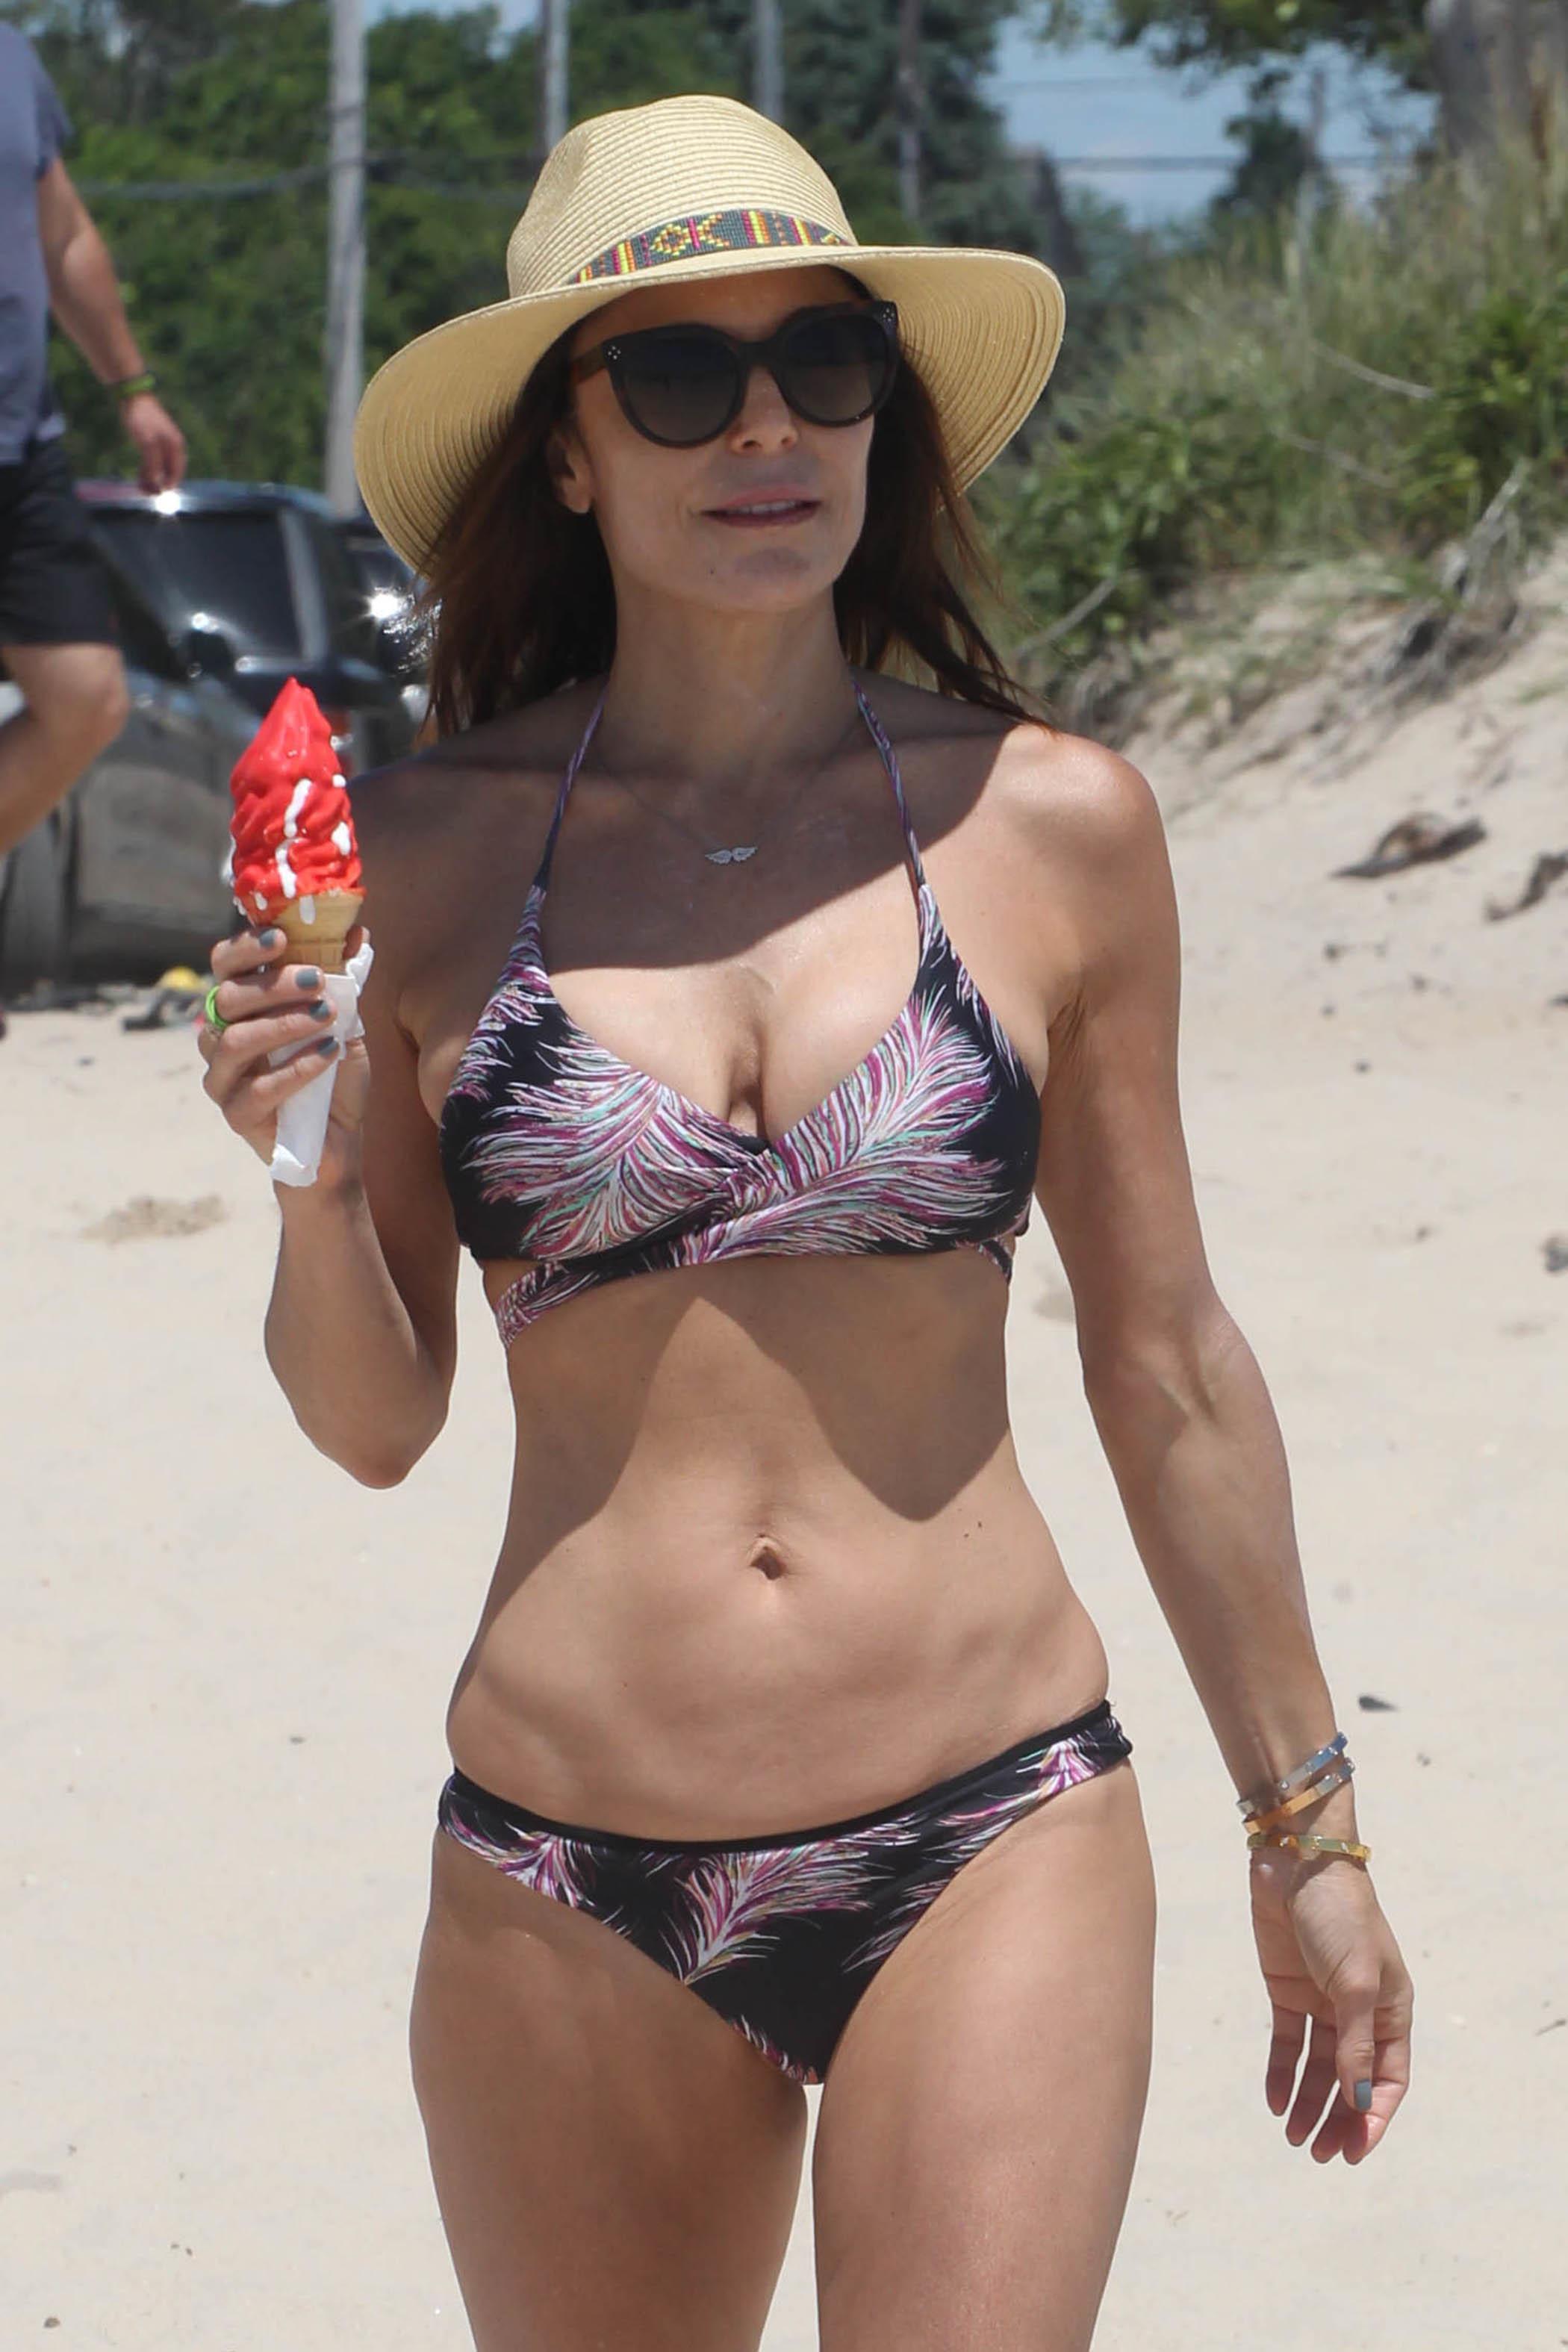 Bethenny Frankel enjoys an ice cream on the beach in the Hamptons on June 27, 2017.